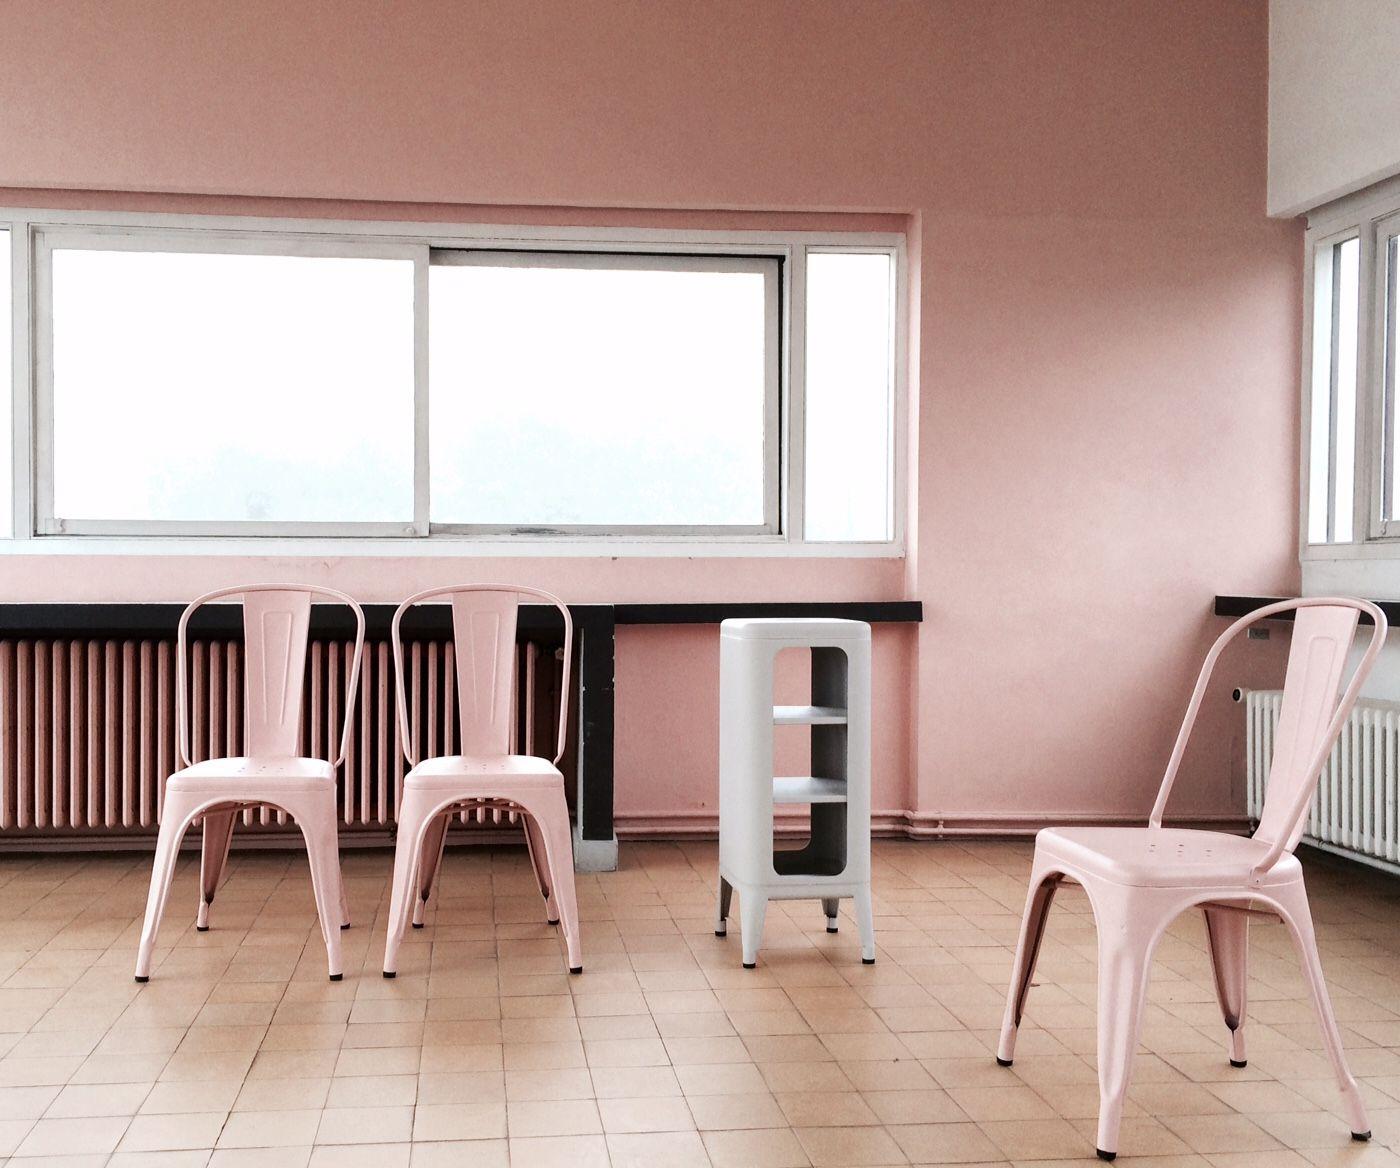 embarquement pour la villa savoye de le corbusier villas and wall colors. Black Bedroom Furniture Sets. Home Design Ideas